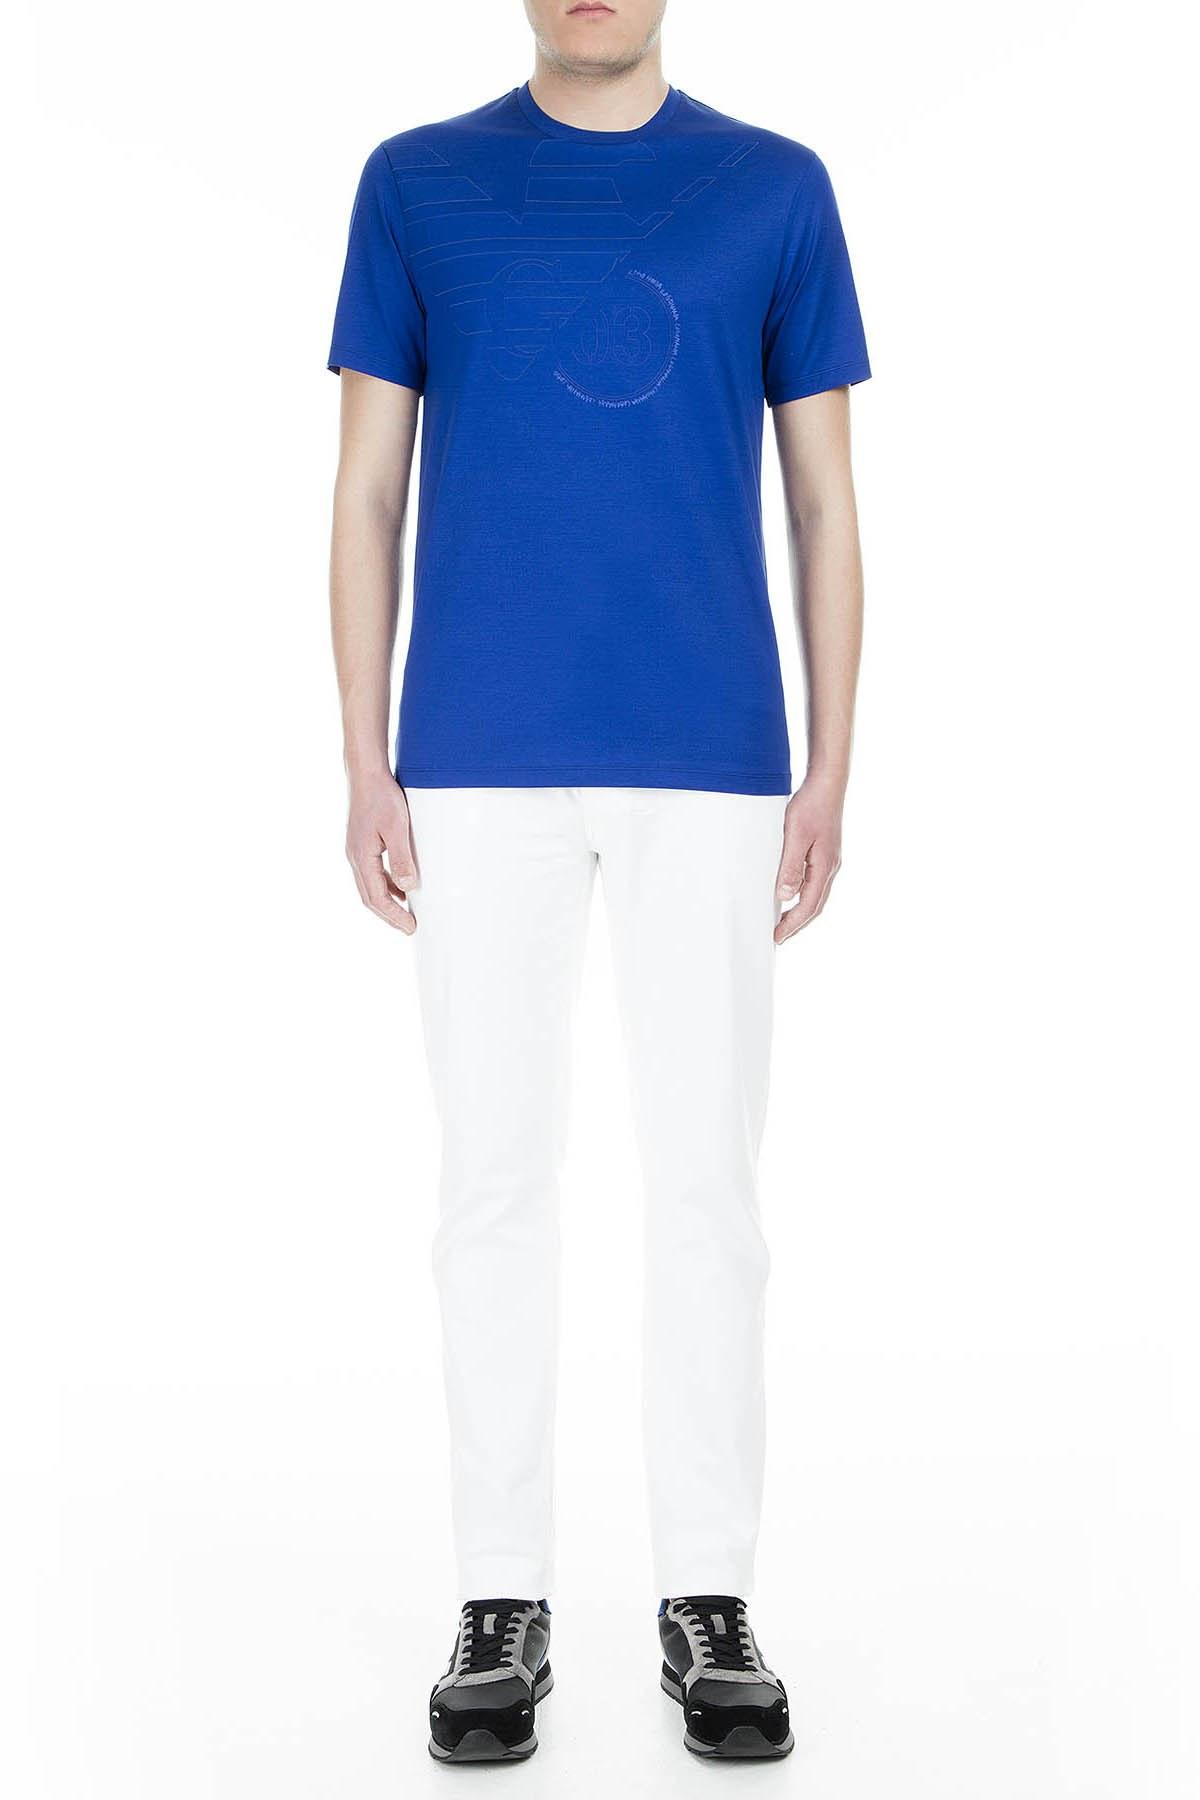 Emporio Armani Erkek T Shirt 3G1TL1 1JTUZ S906 SAKS